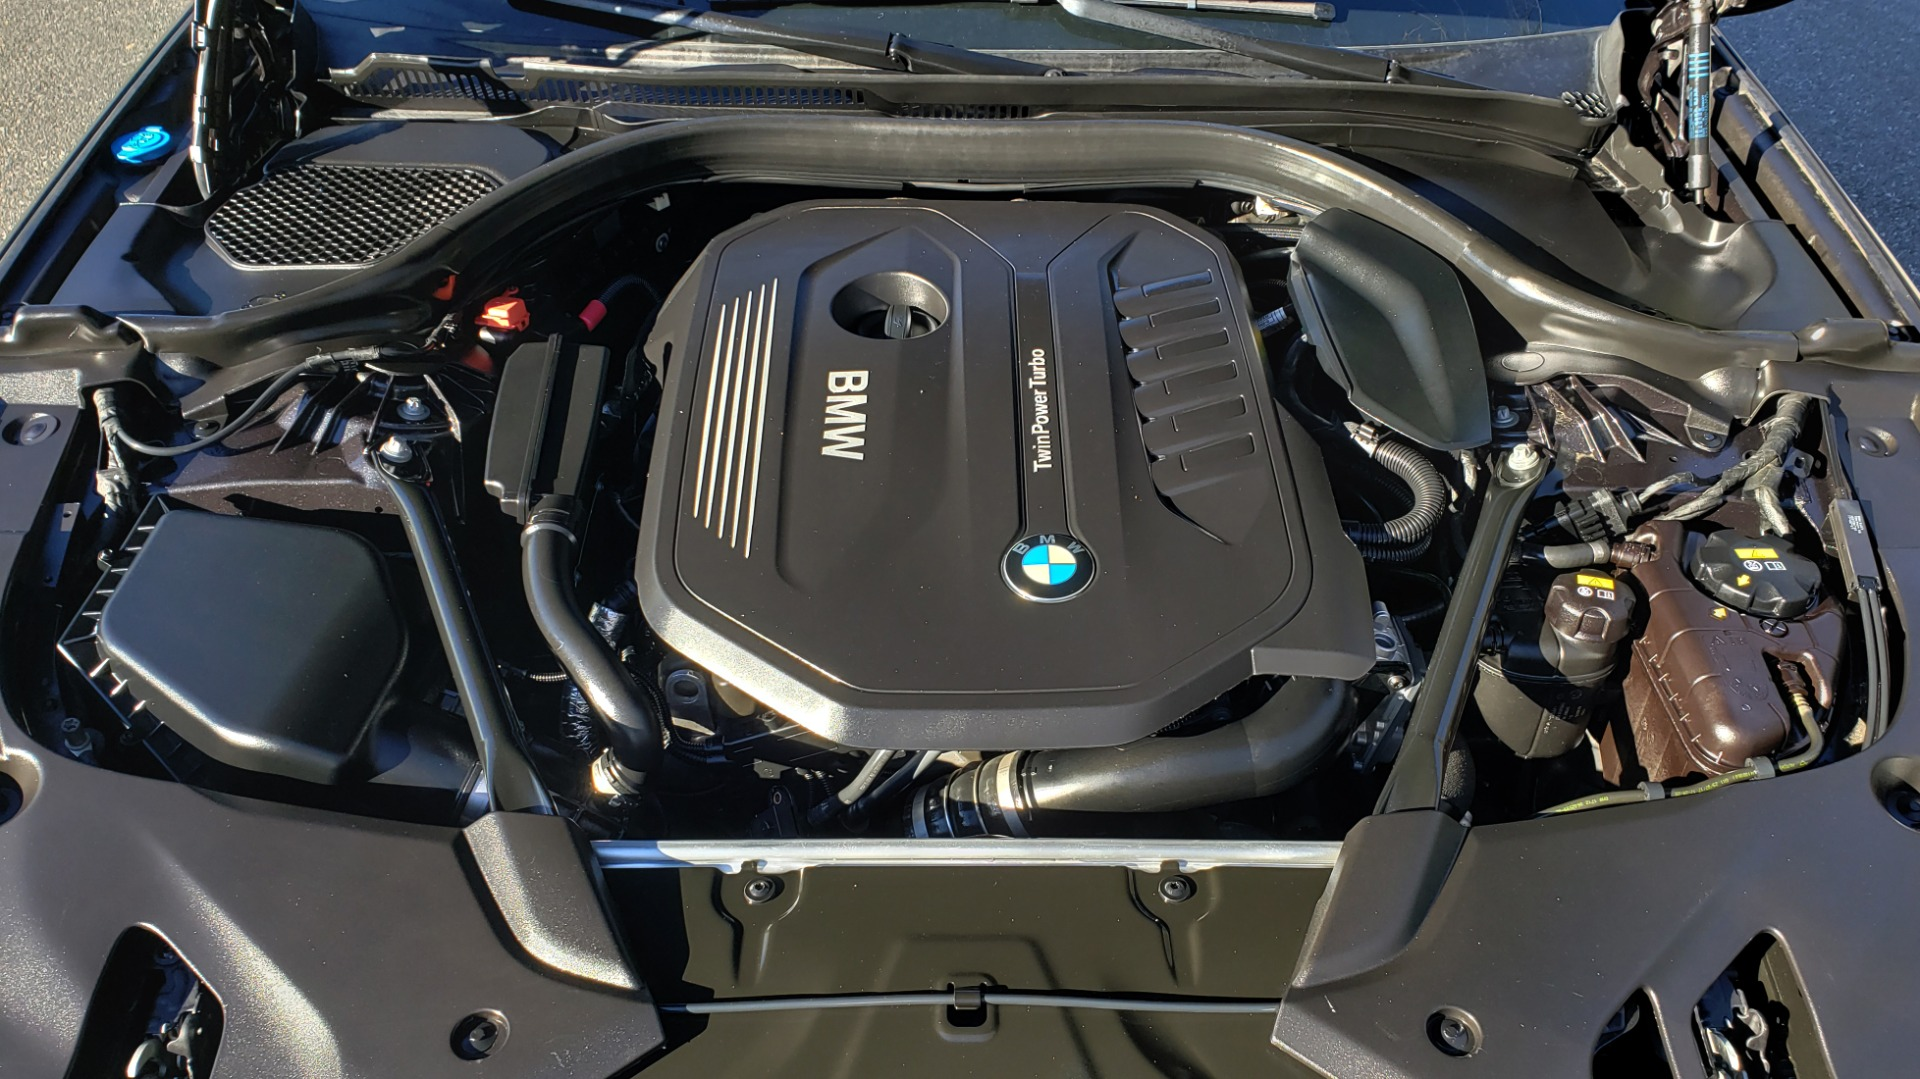 Used 2018 BMW 5 SERIES 540I M-SPORT / DRVR ASST / EXEC PKG / NAV / SUNROOF / HUD / REARVIEW for sale Sold at Formula Imports in Charlotte NC 28227 12